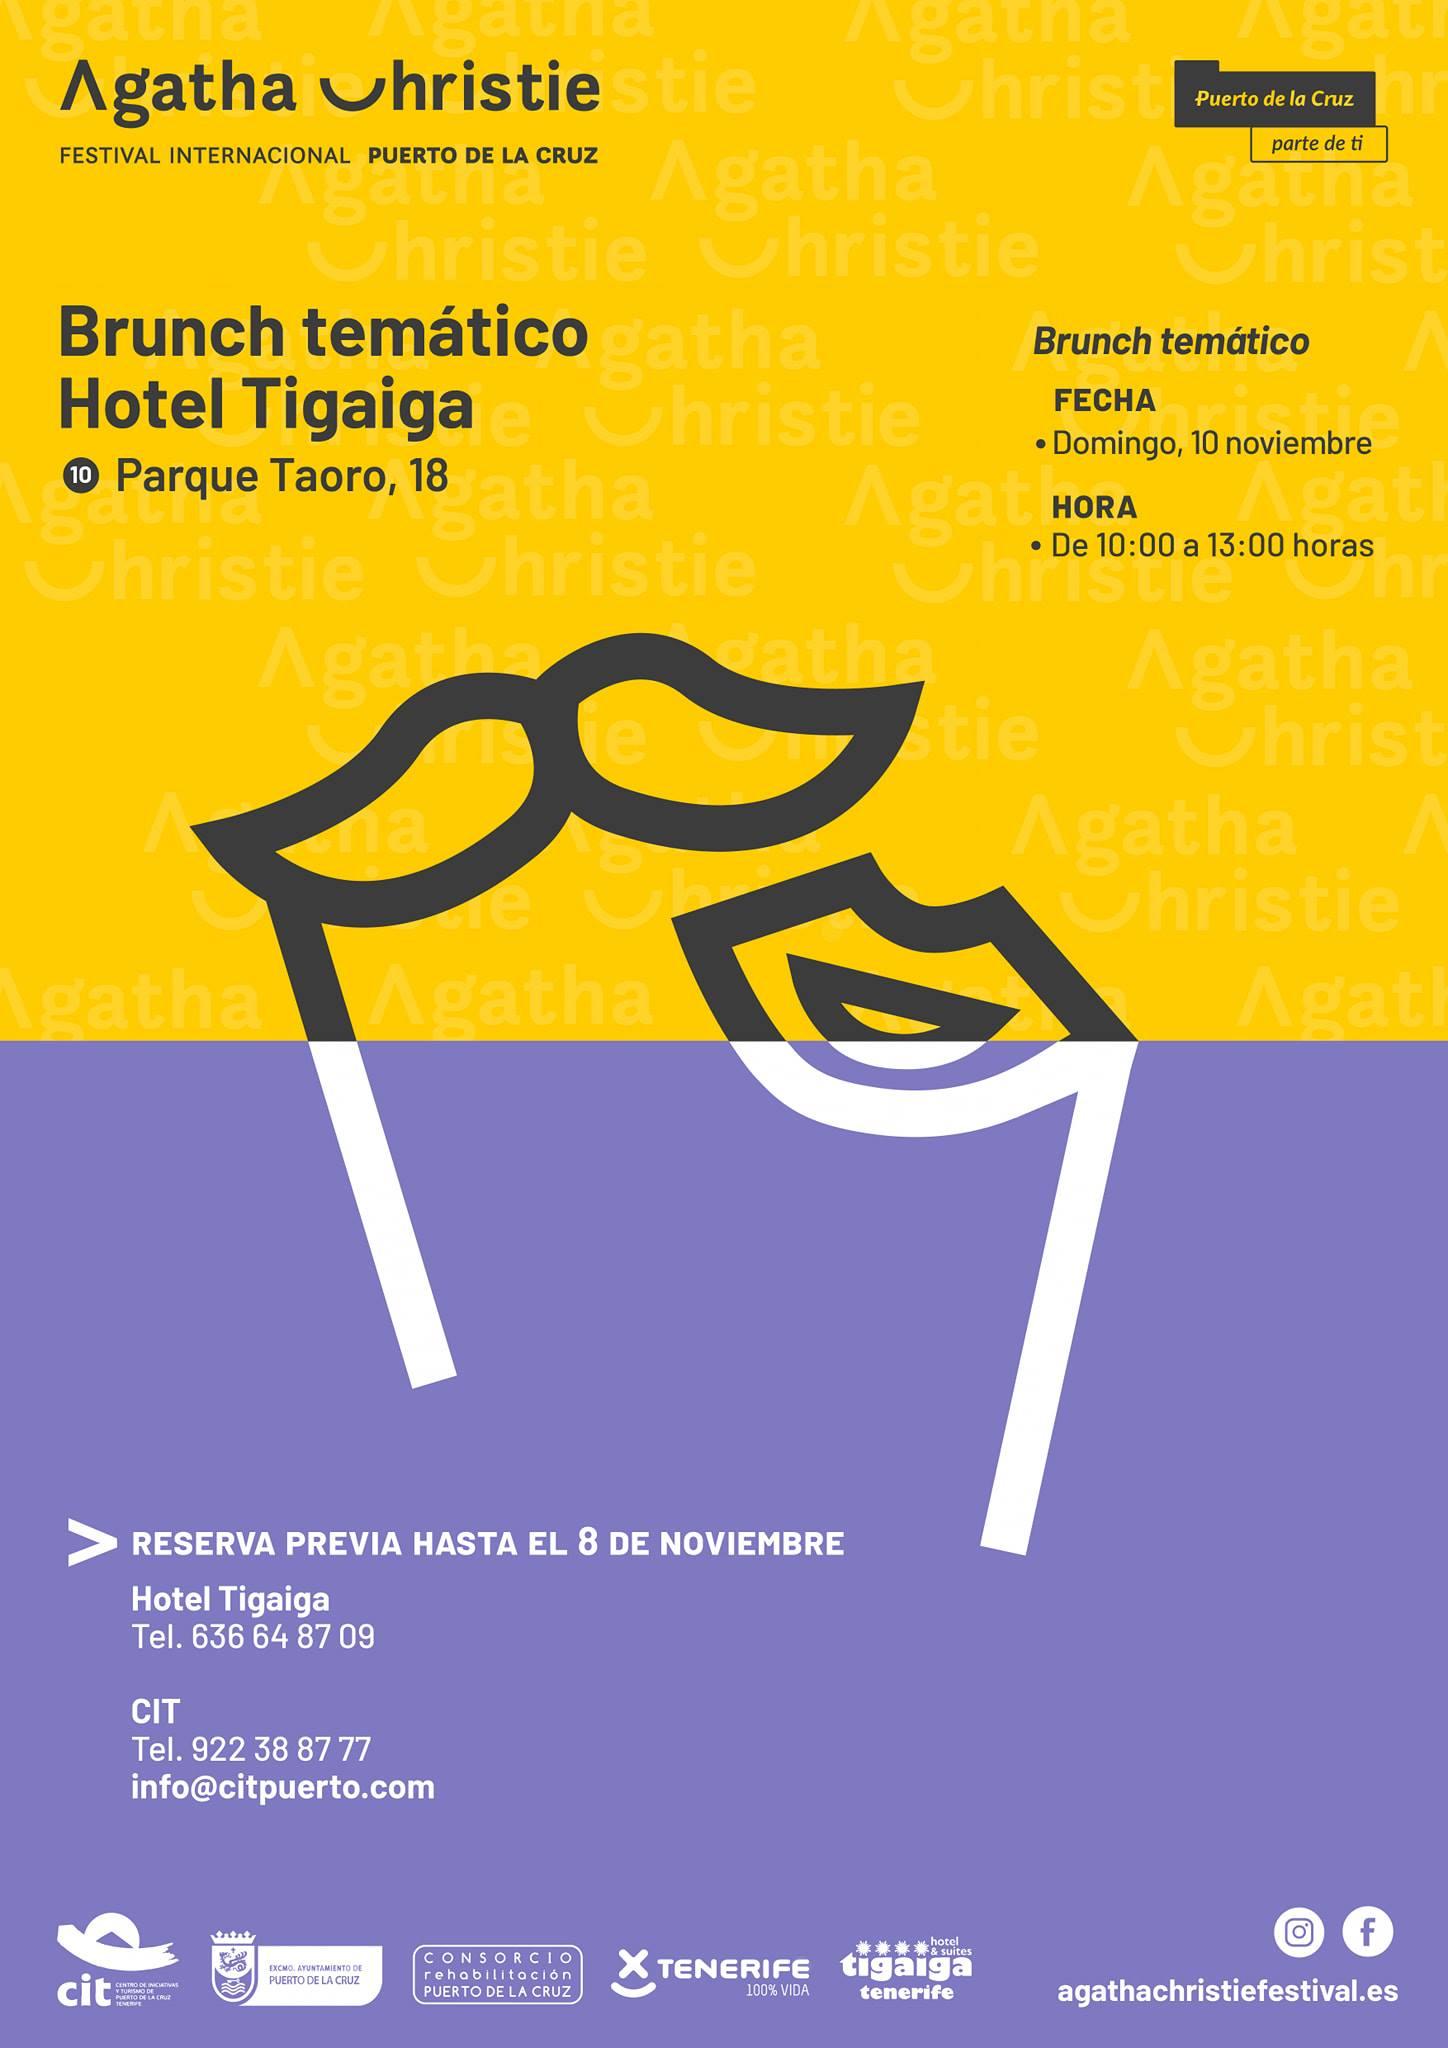 Thematic Brunch Hotel Tigaiga